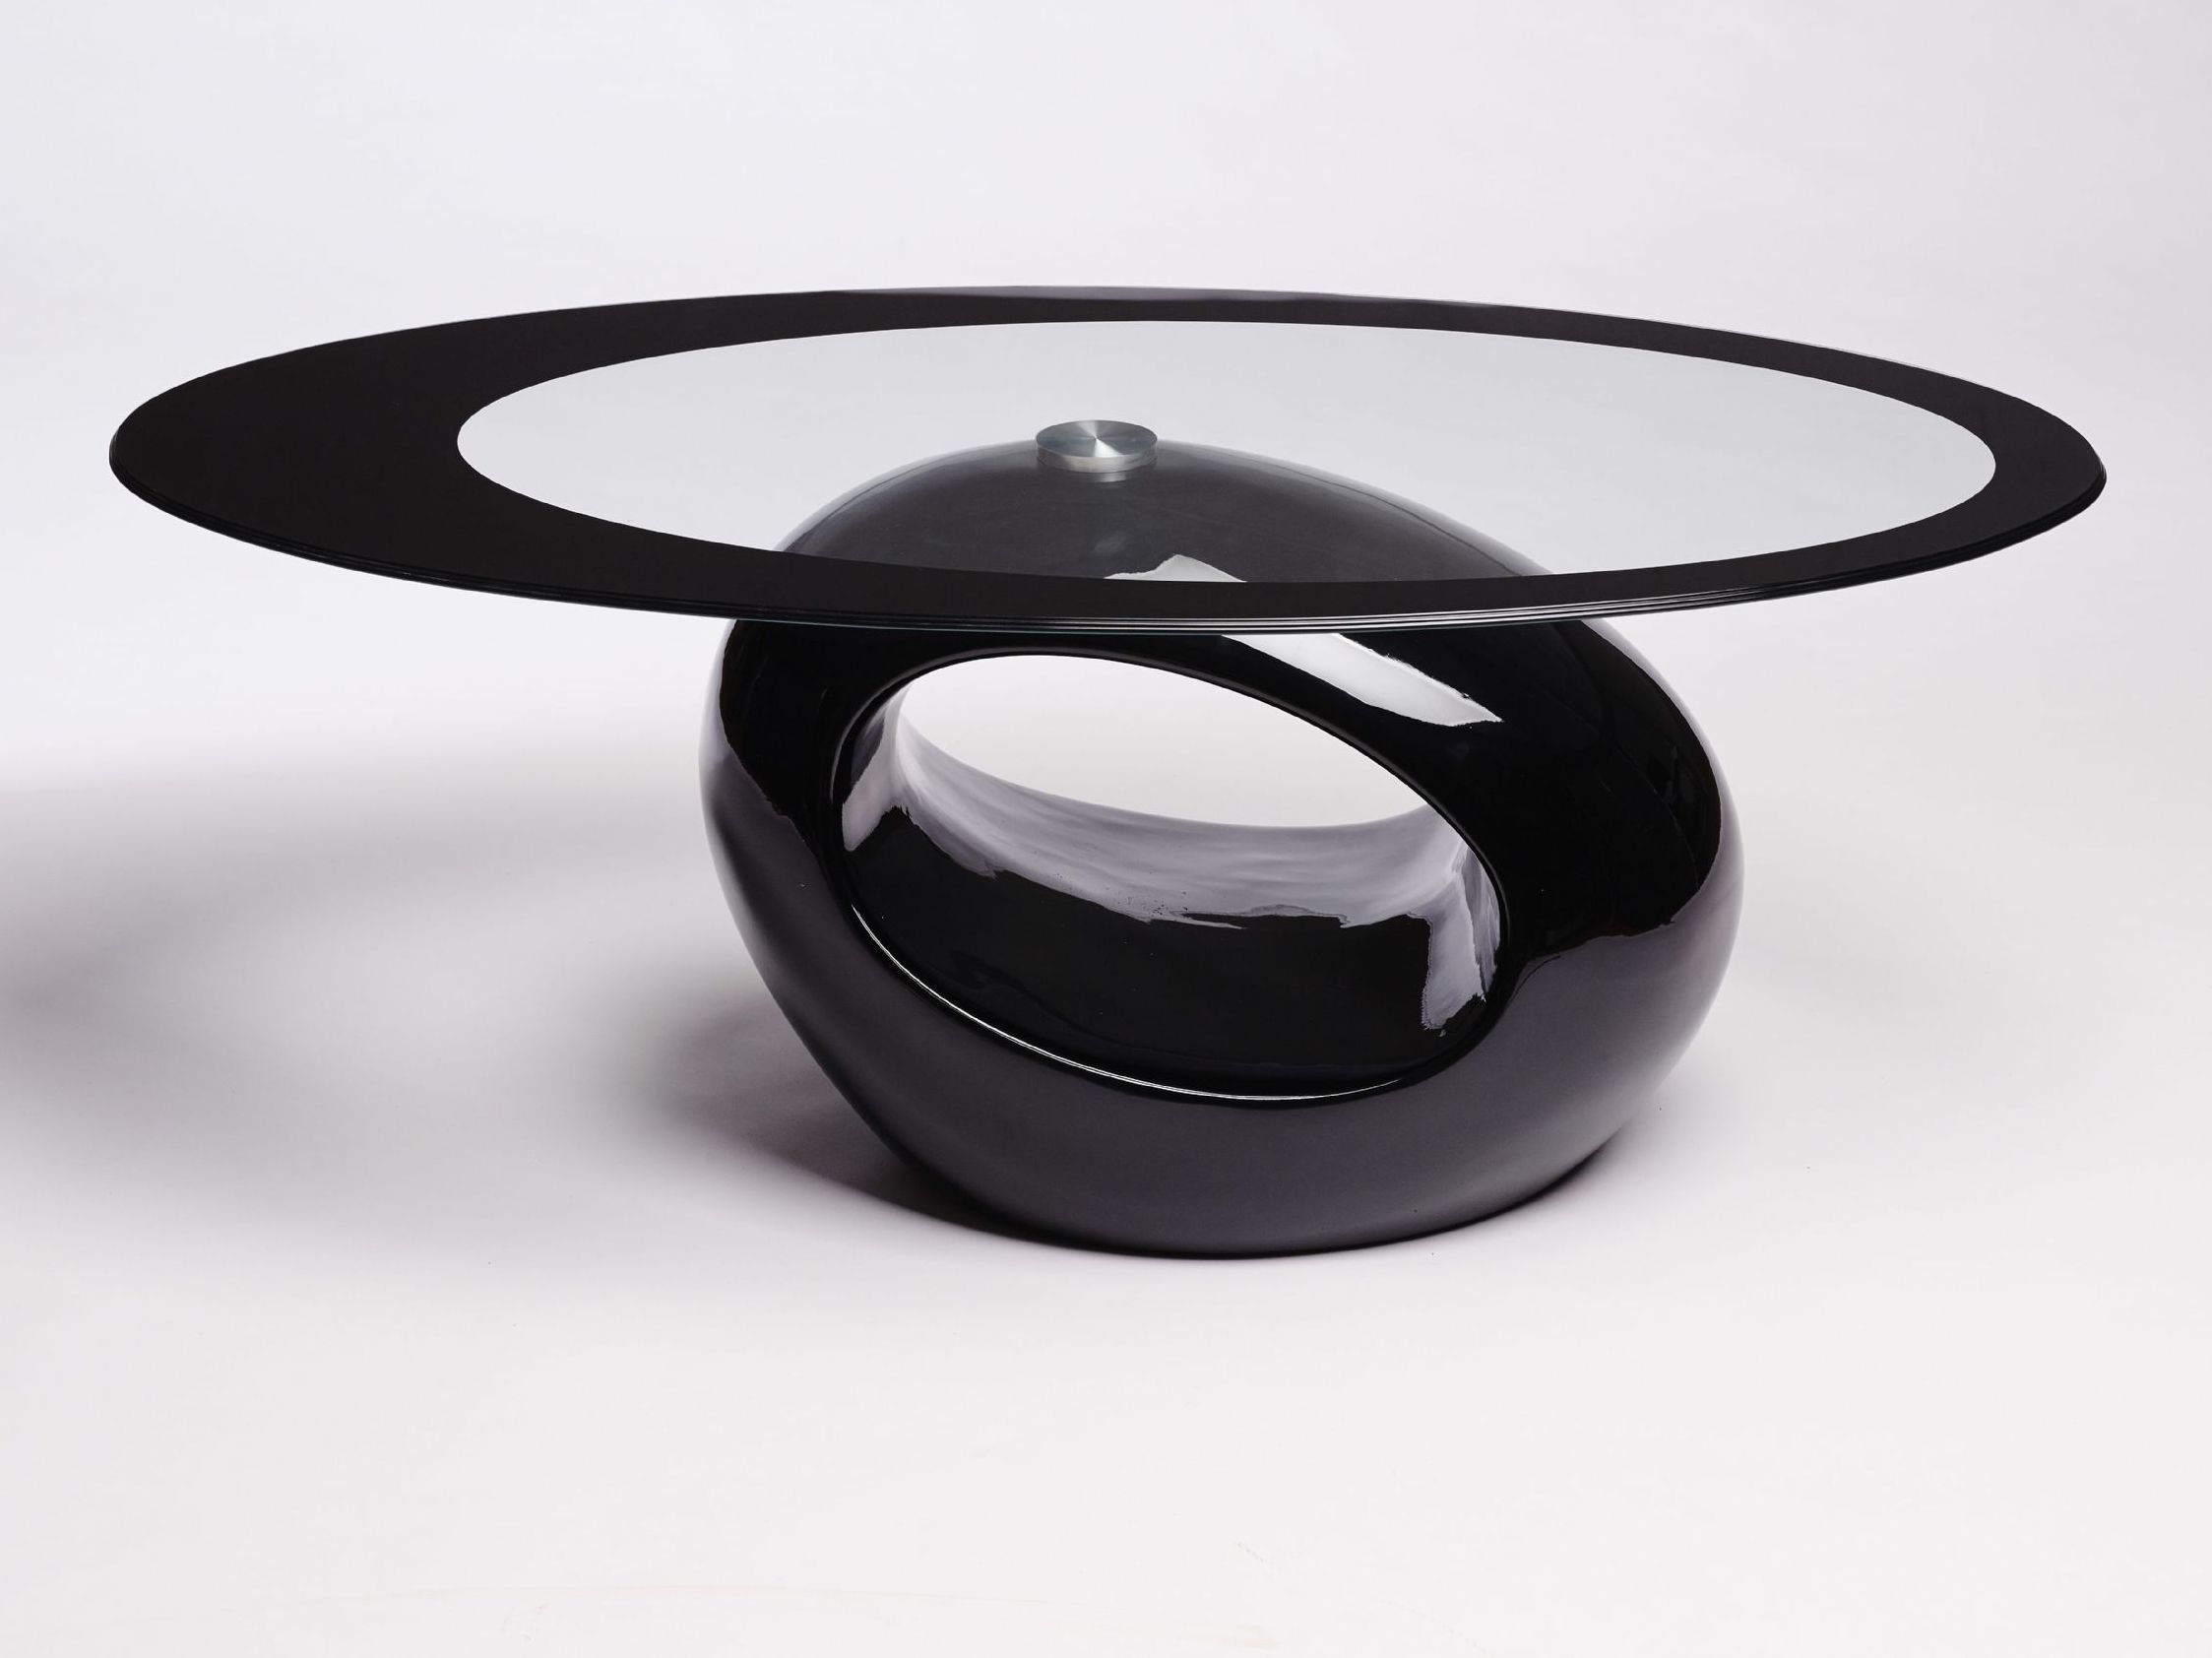 Futuristic Black Coffee Table